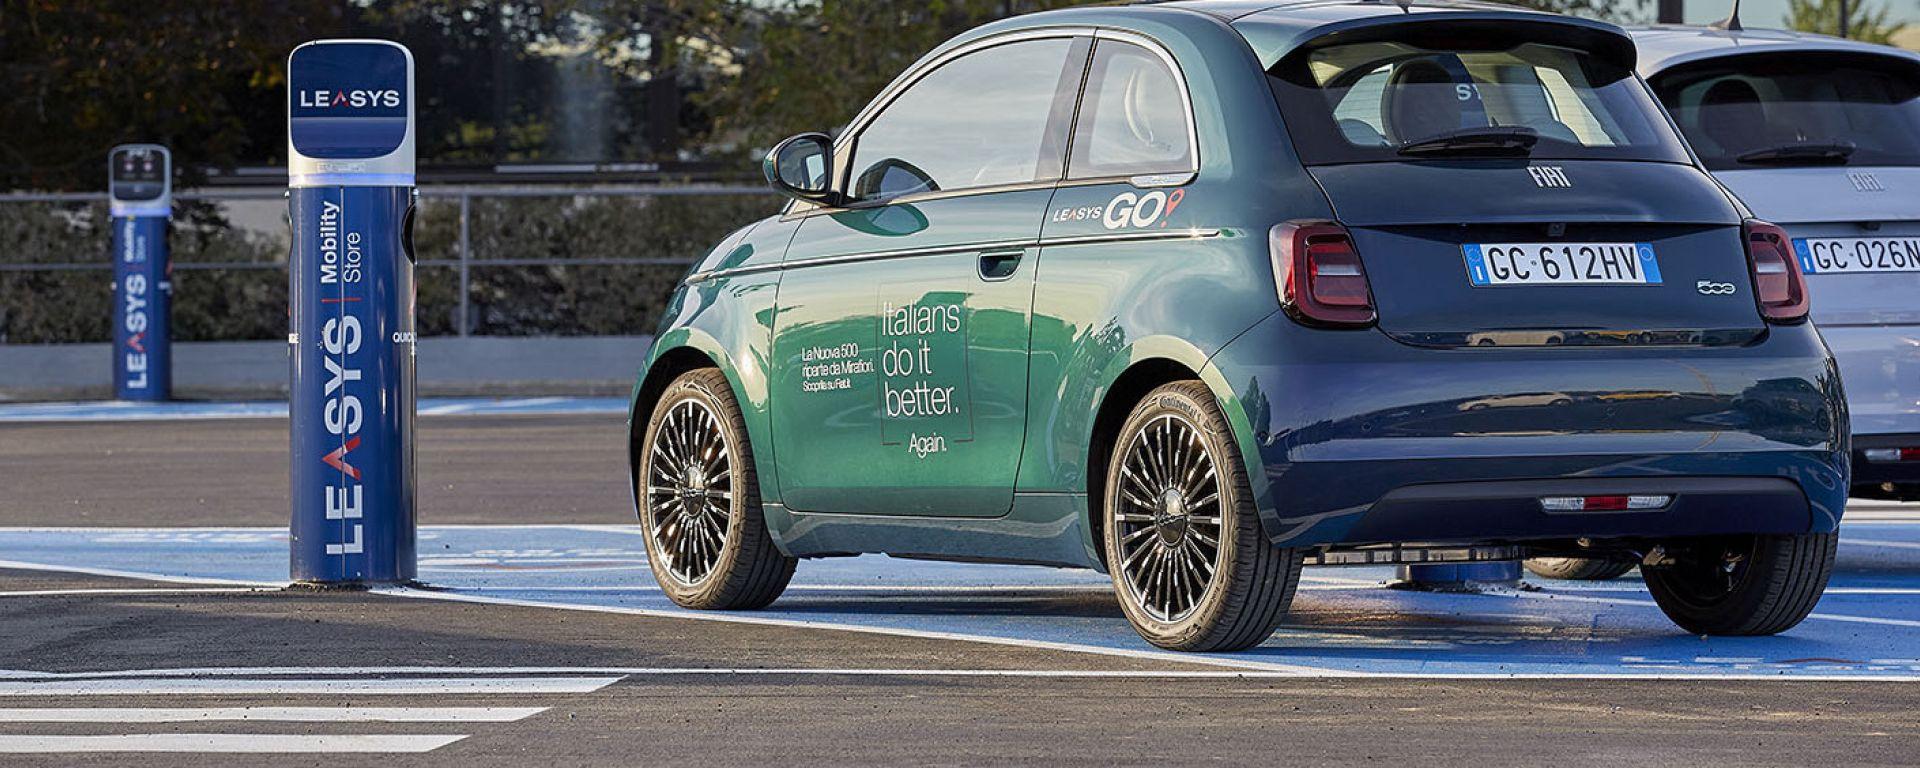 FCA Digital Days, perché a gennaio comprare Fiat conviene